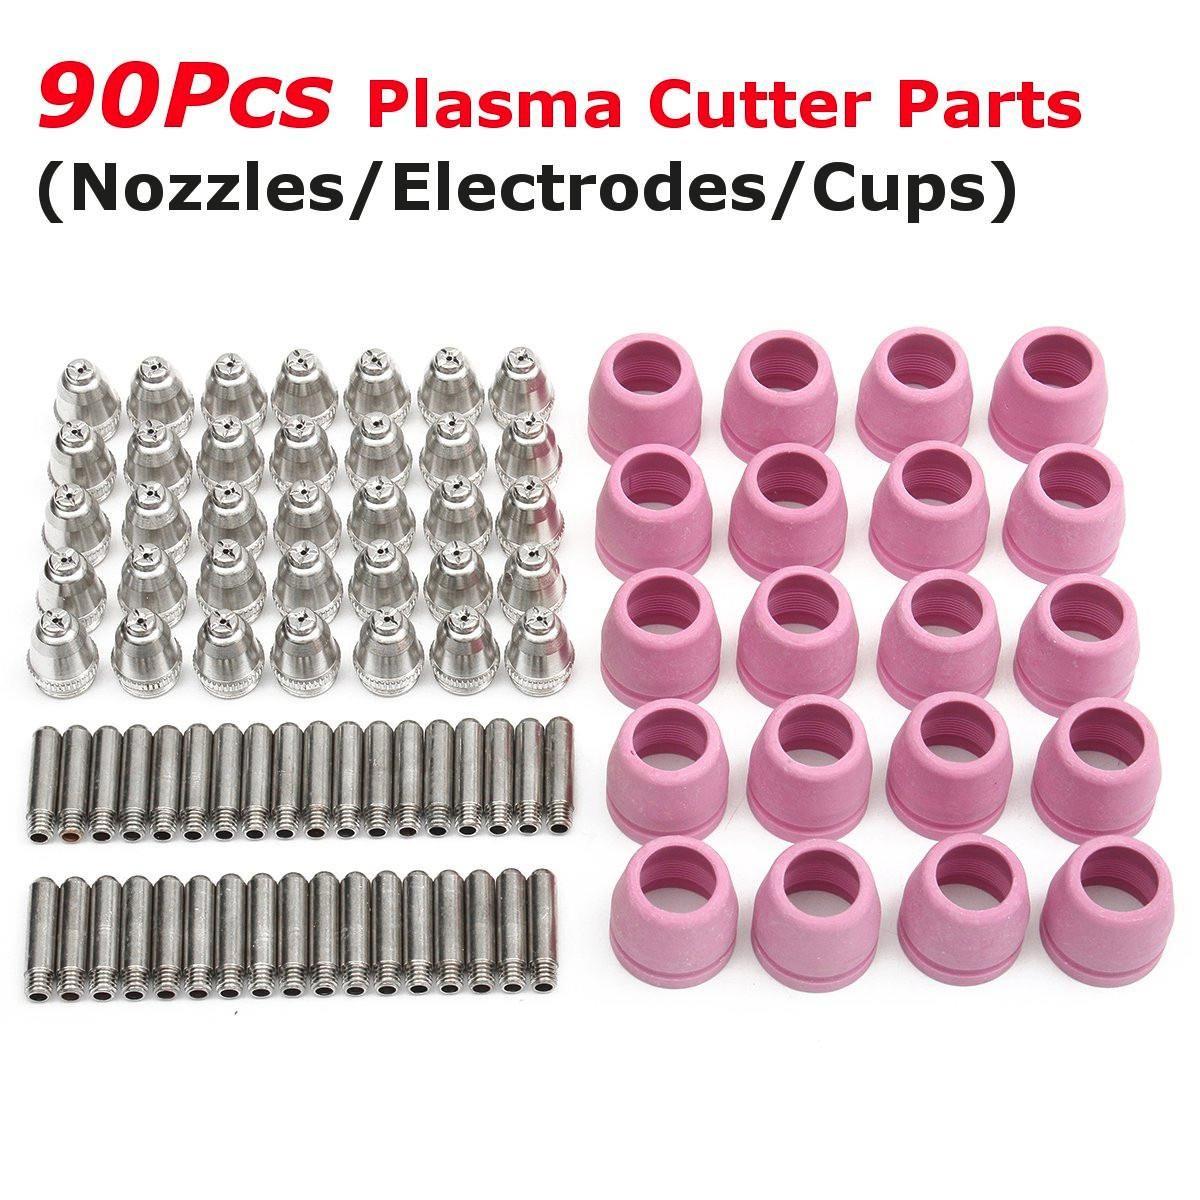 ARC Plasma Cutter Verbrauchs Kit 35 stücke Schweißen Düsen + 35 stücke Elektroden + 20 stücke Schild Tassen für LTP5000D LTPDC2000 LTPAC2500